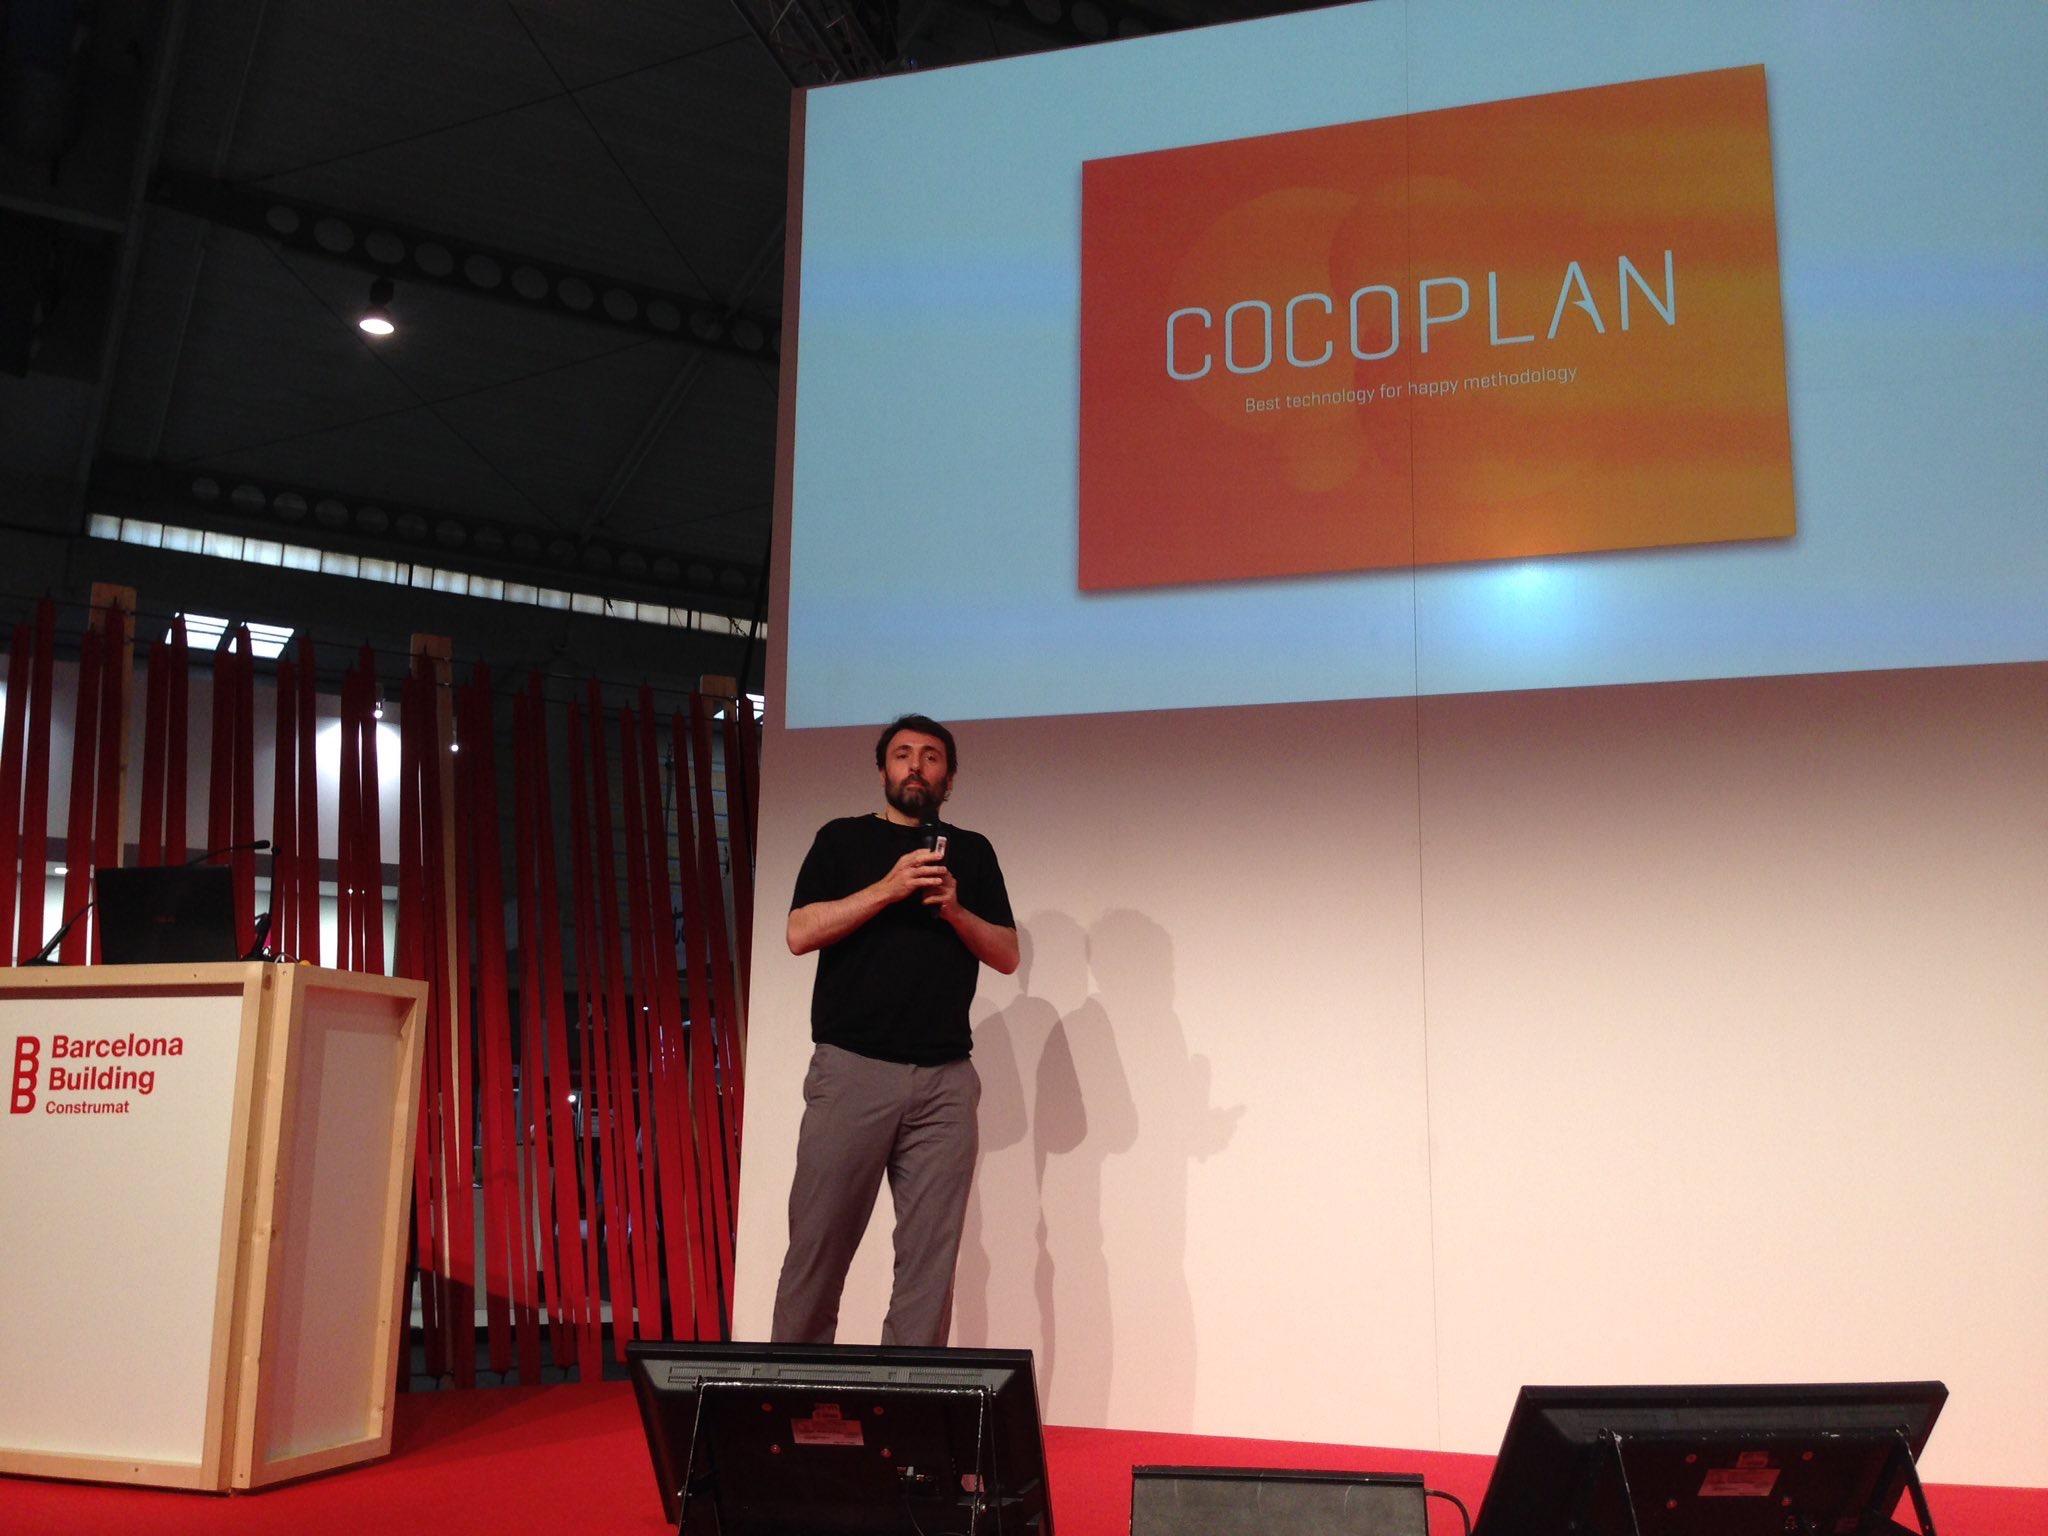 software-cocoplan-logo